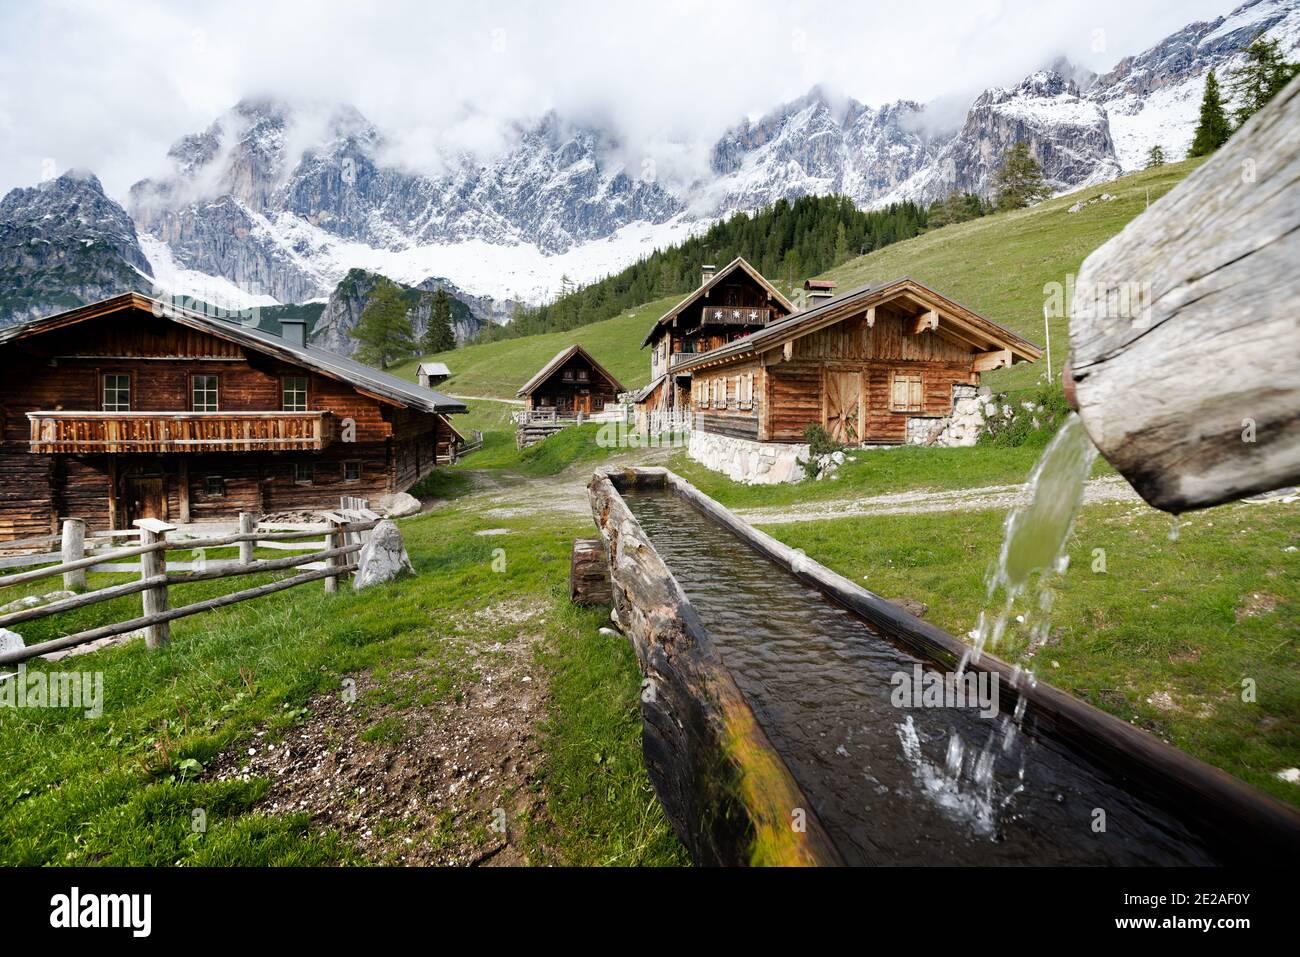 Scenic mountain village with old cabins in the Austrian Alps, Neustattalm, Ramsau am Dachstein, Styria region, Austria Stock Photo